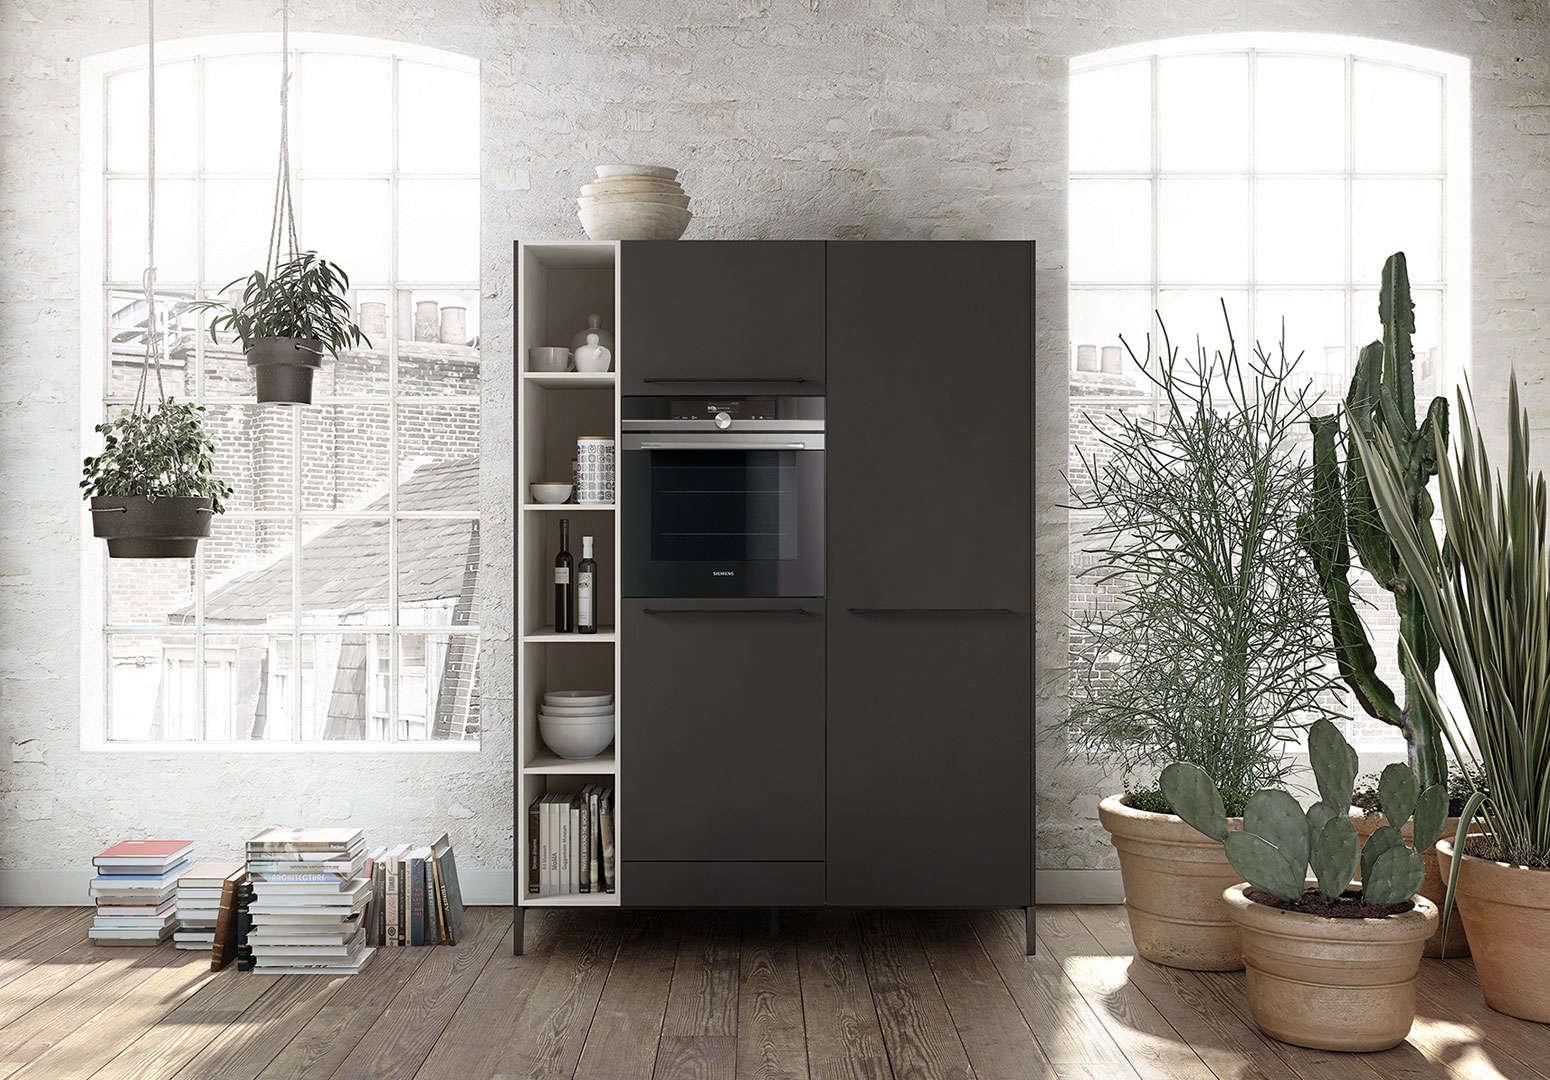 The minimalist kitchen cabinet from SieMatic's Urban line | Remodelista